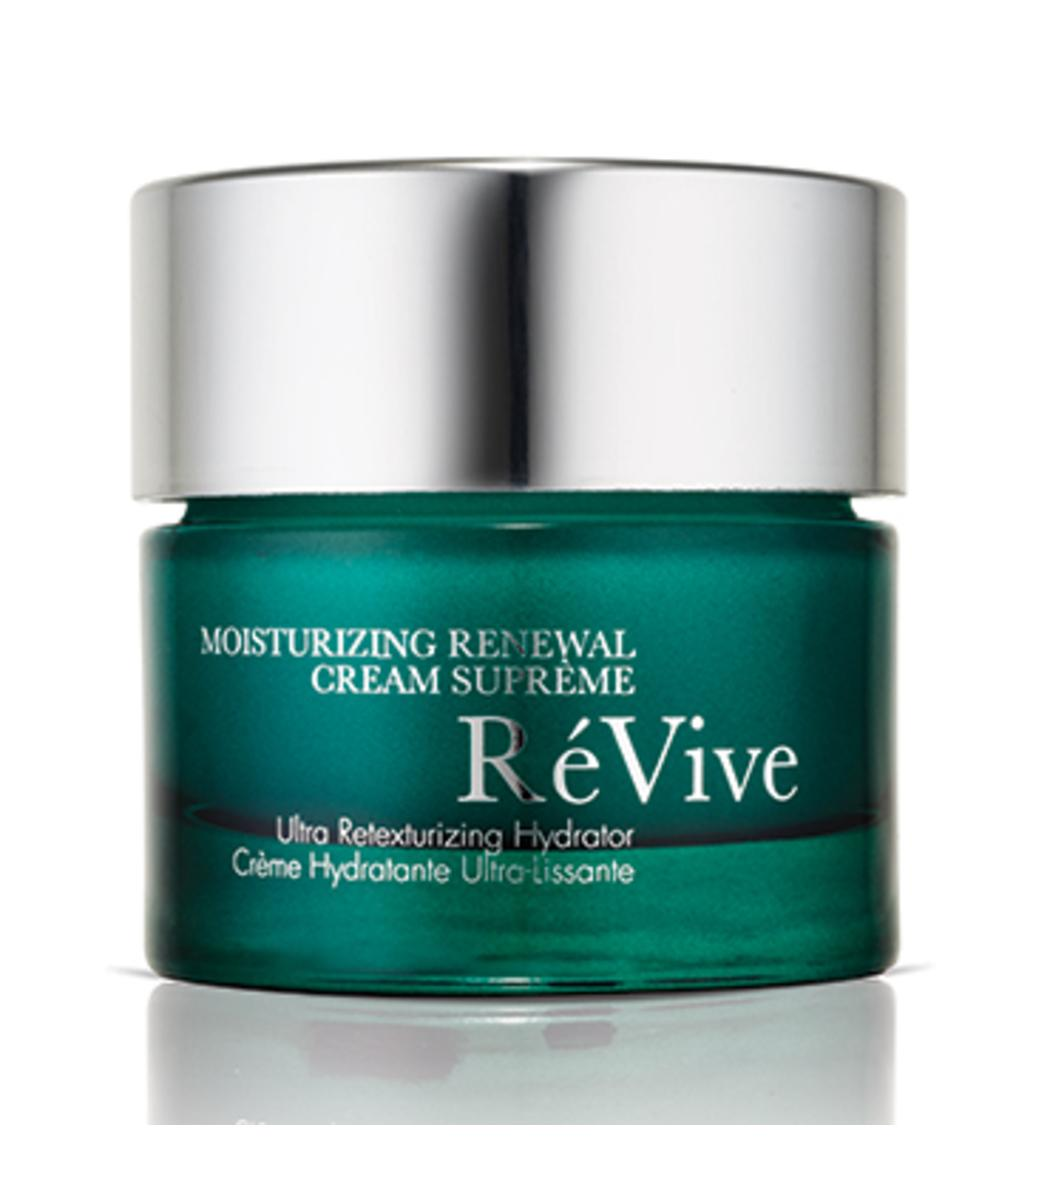 Revive Moisturizing Renewal Cream Supreme In N/A